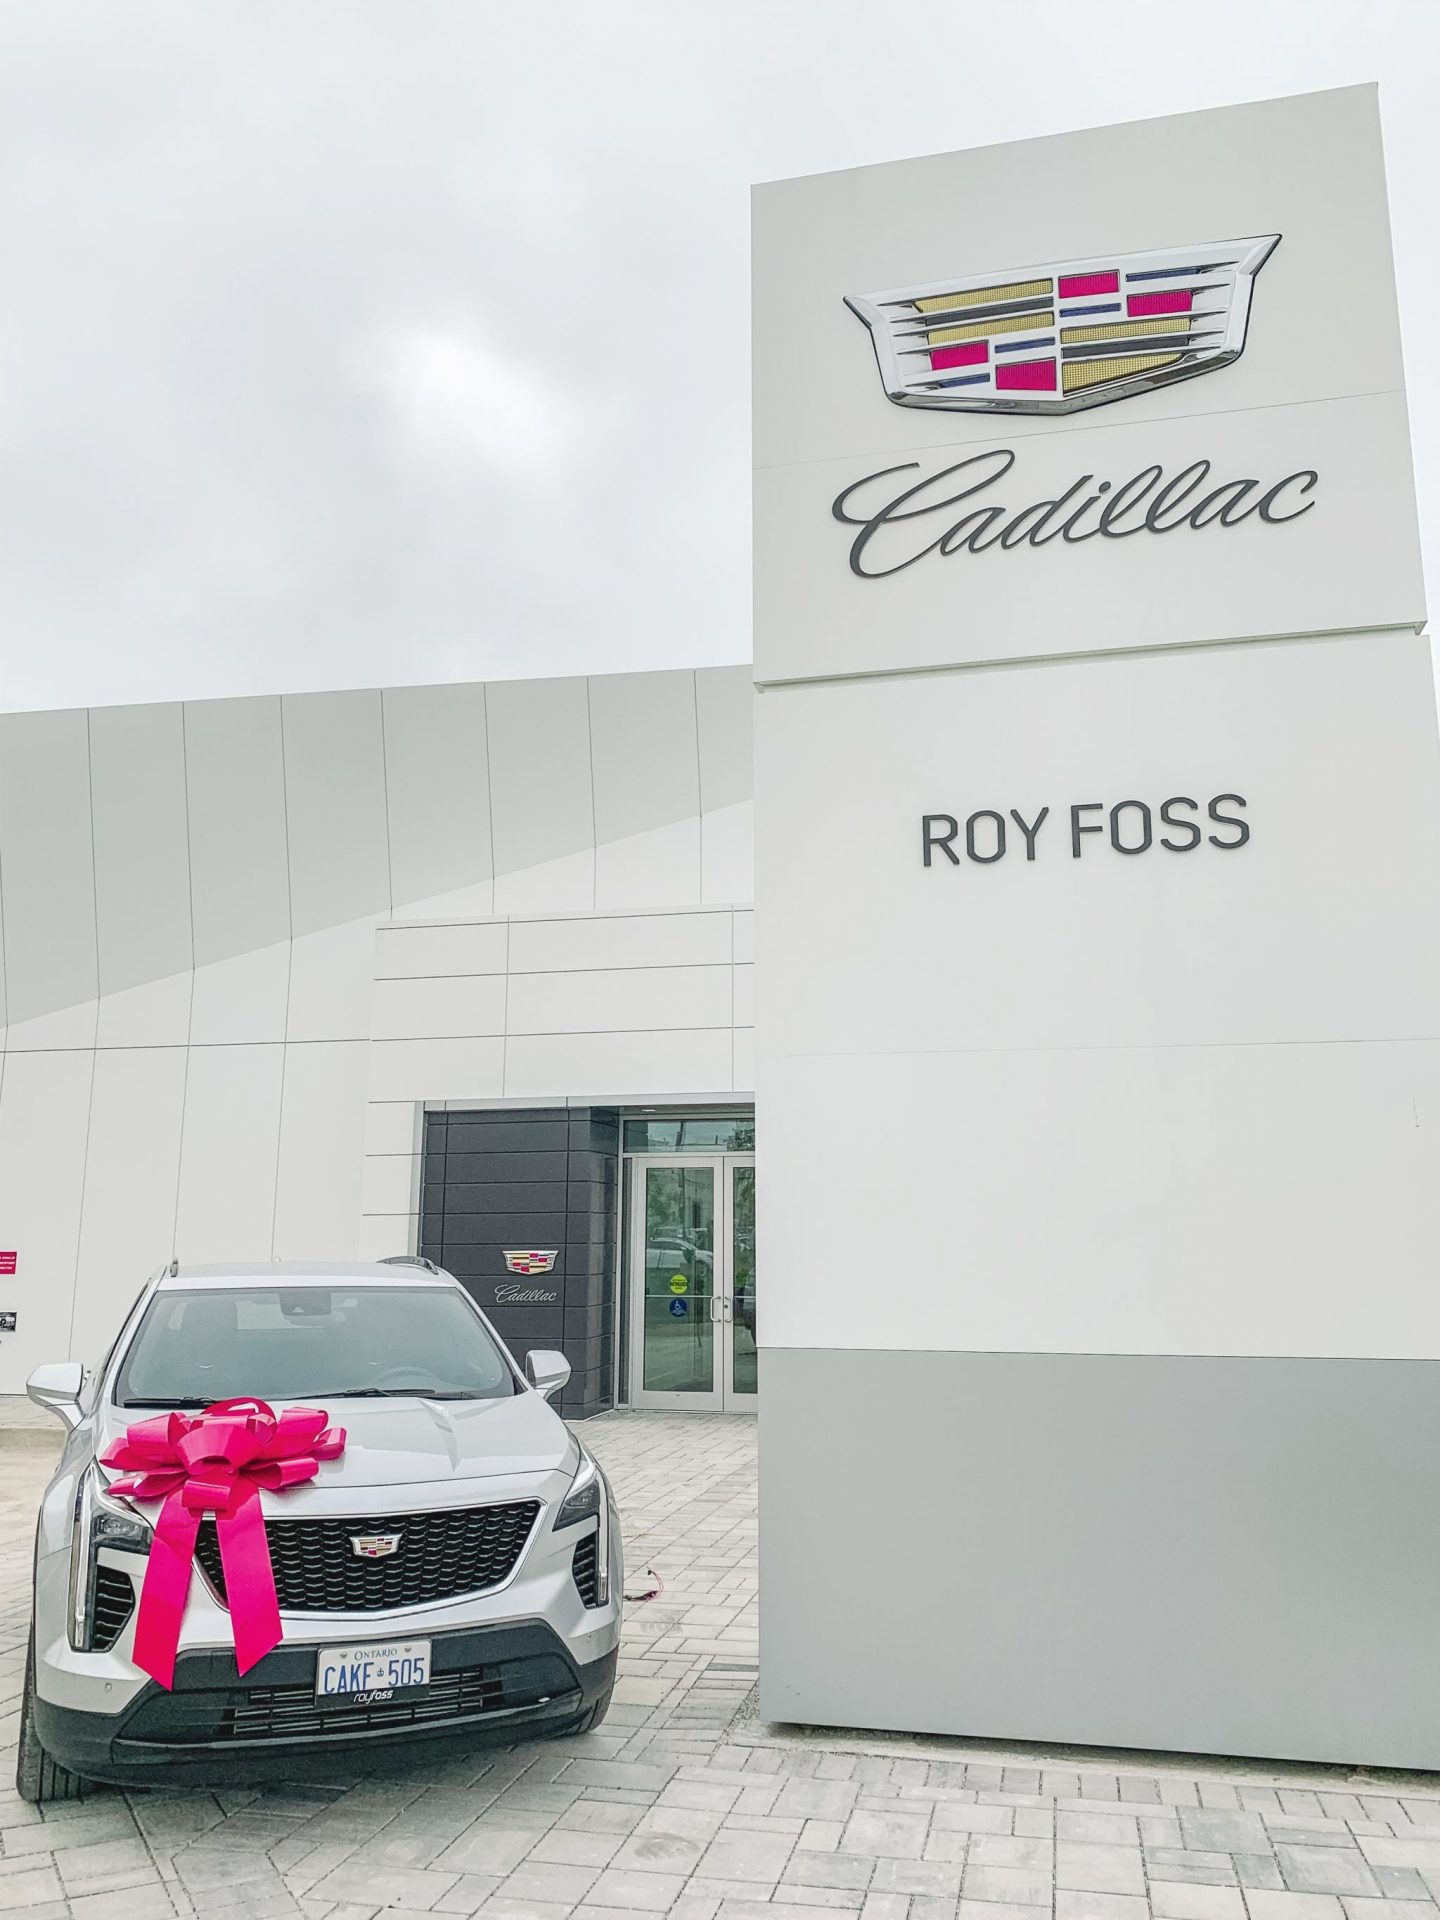 Cadillac Roy Foss Woodbridge